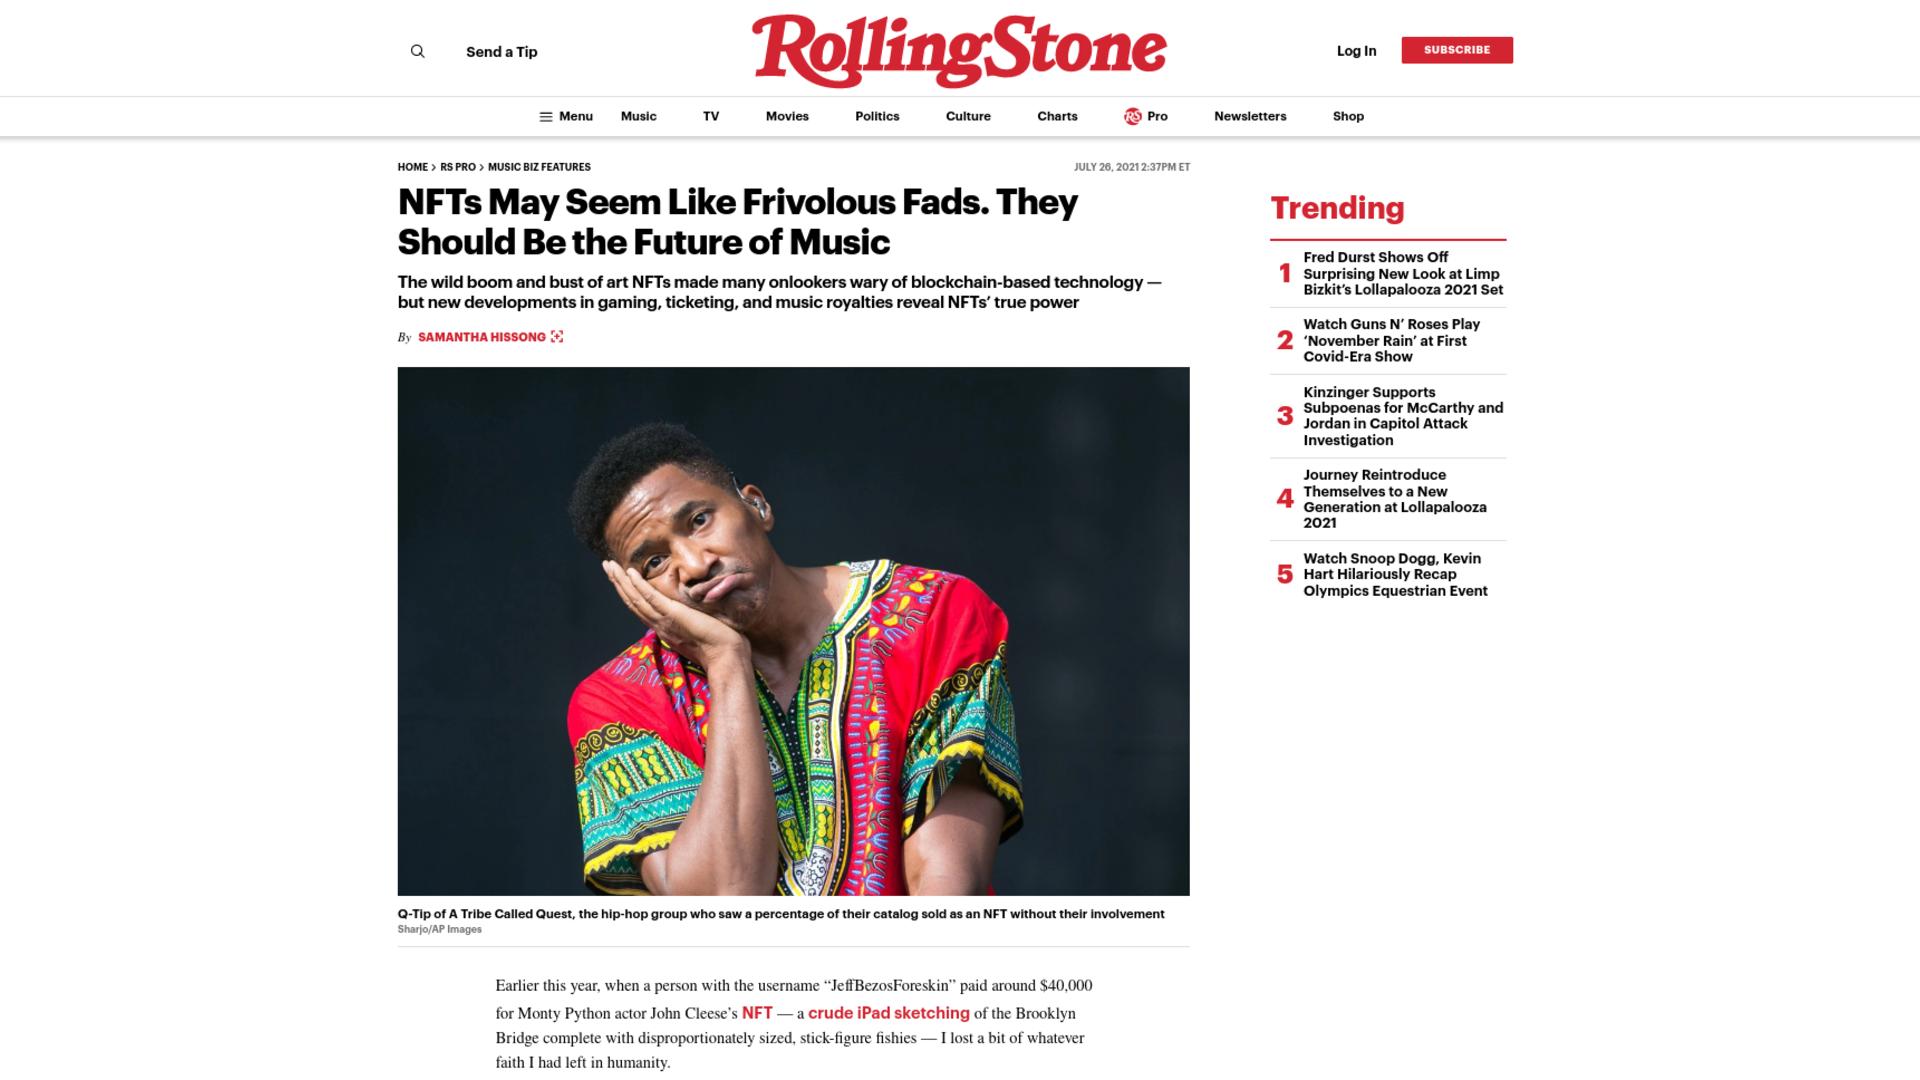 Fairness Rocks News NFTs May Seem Like Frivolous Fads. They Should Be the Future of Music